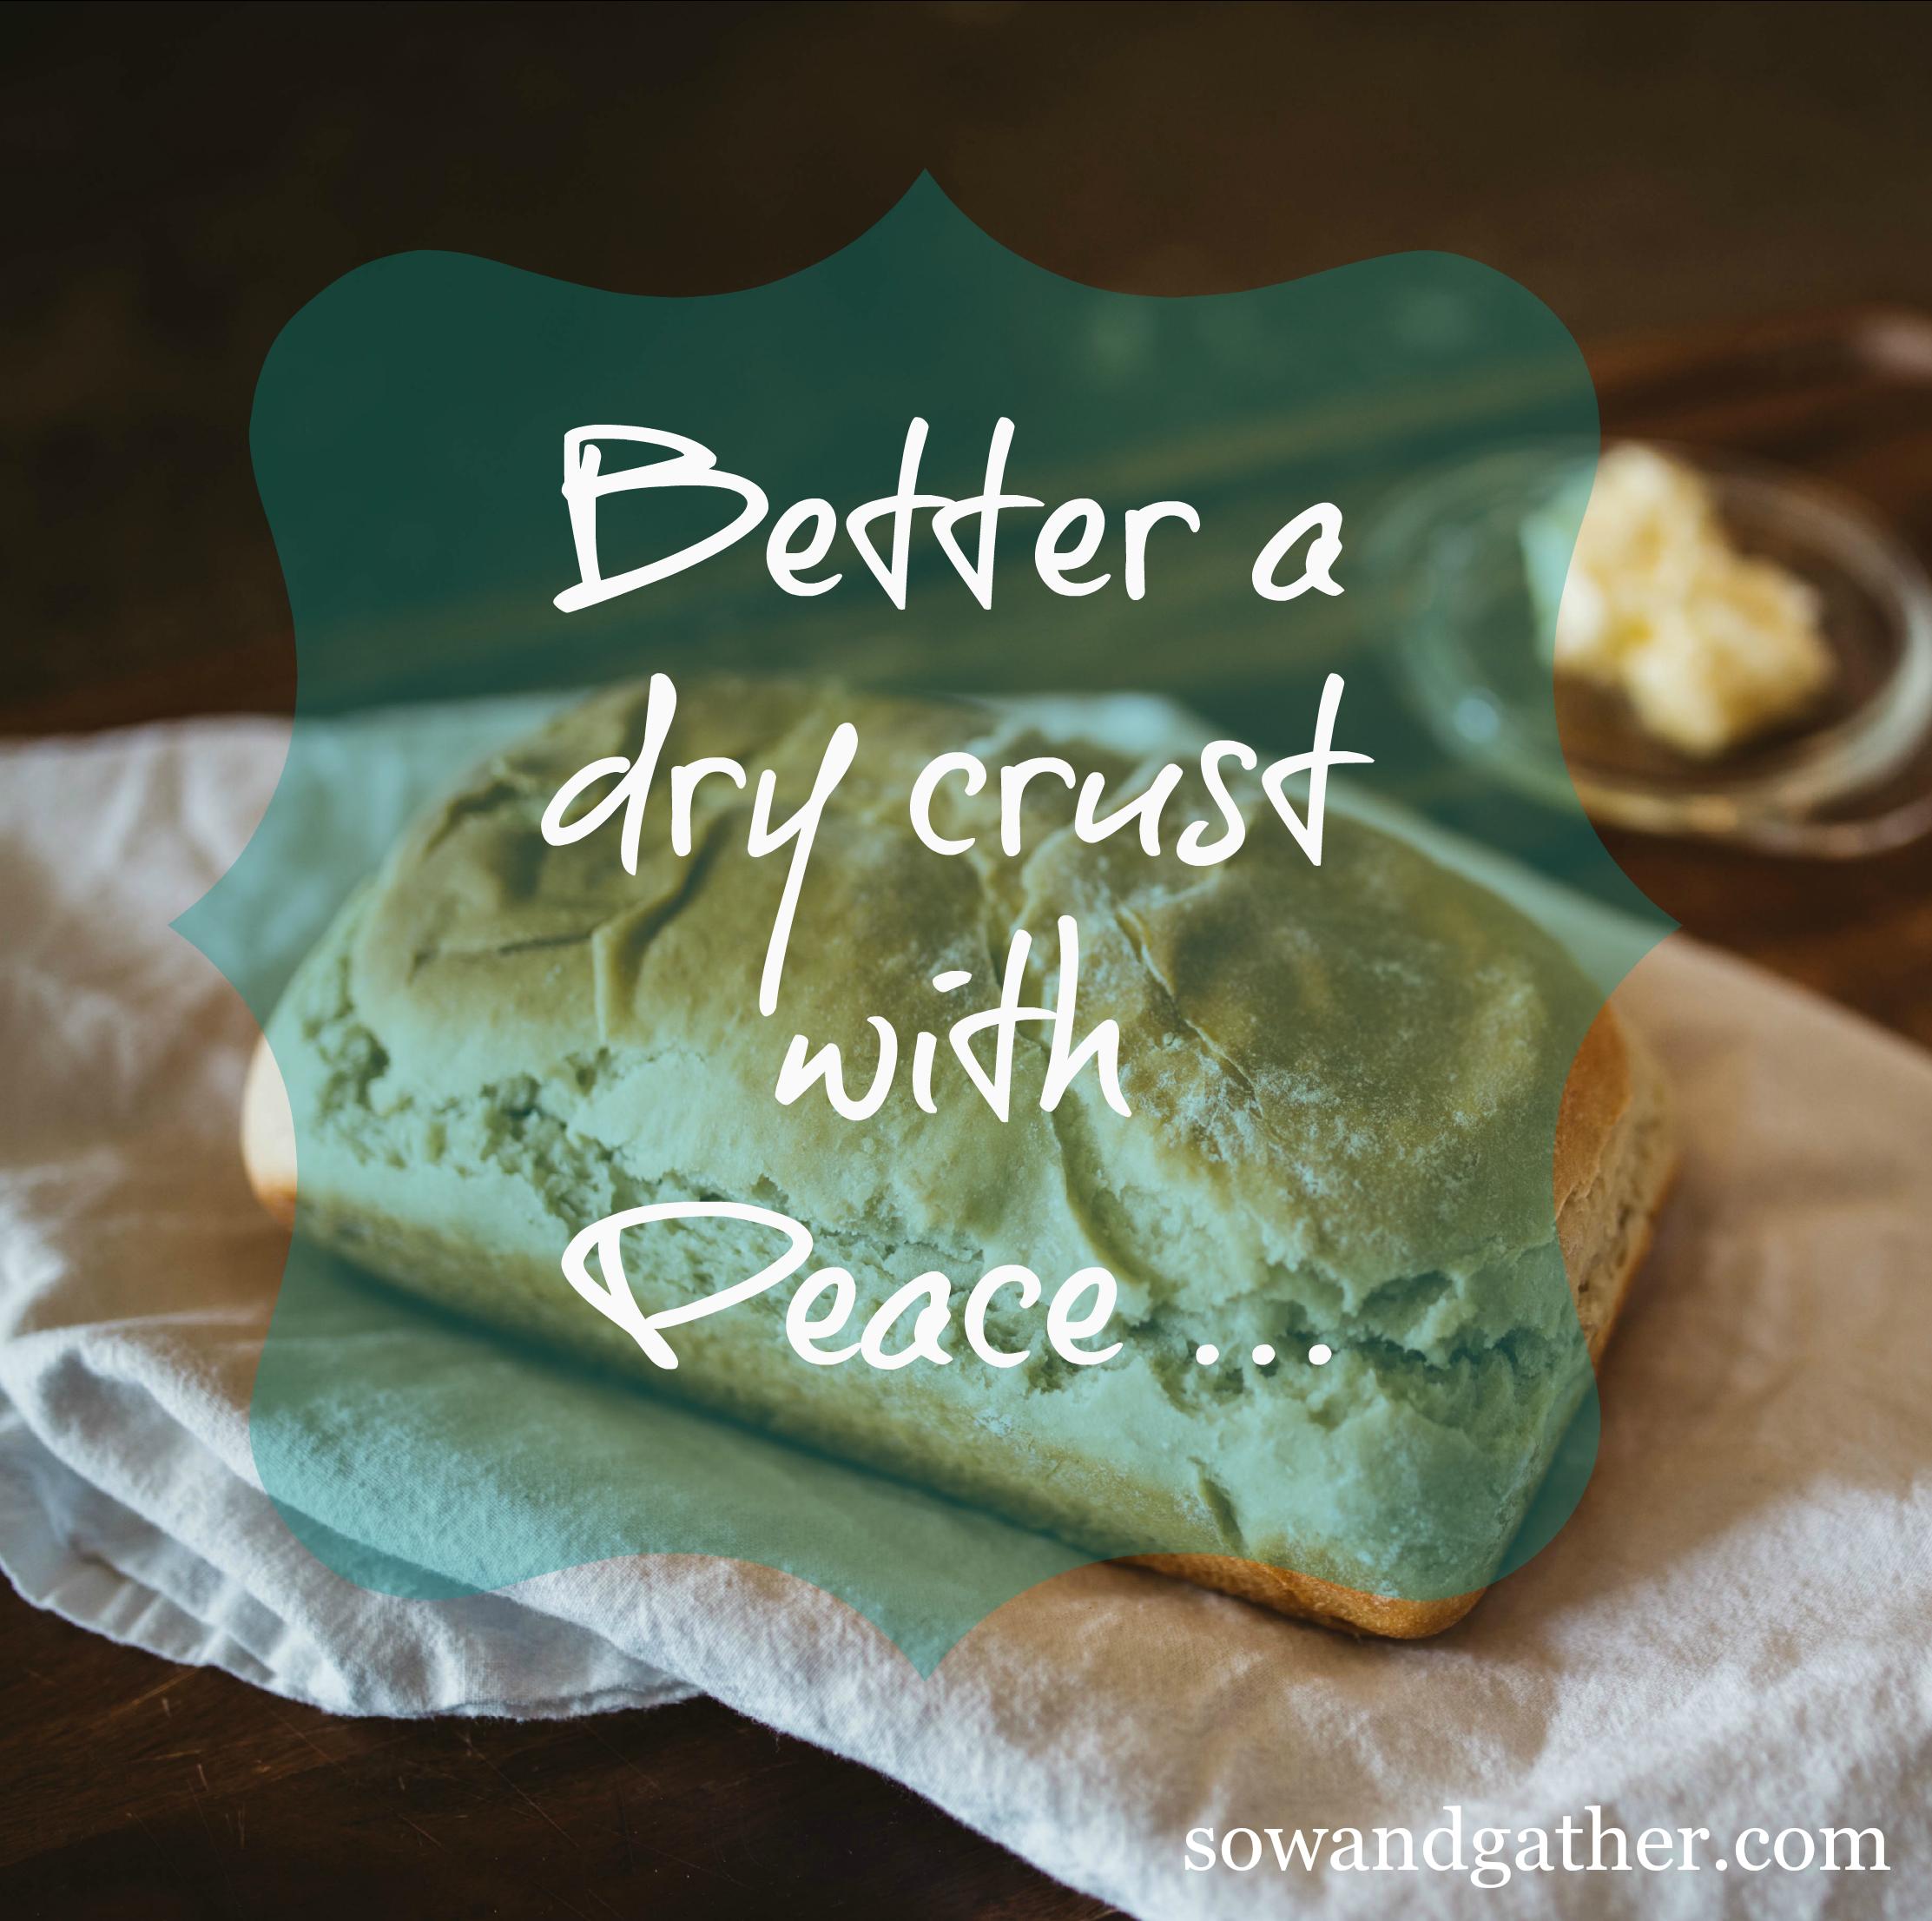 better-a-dry-crust-sowandgather